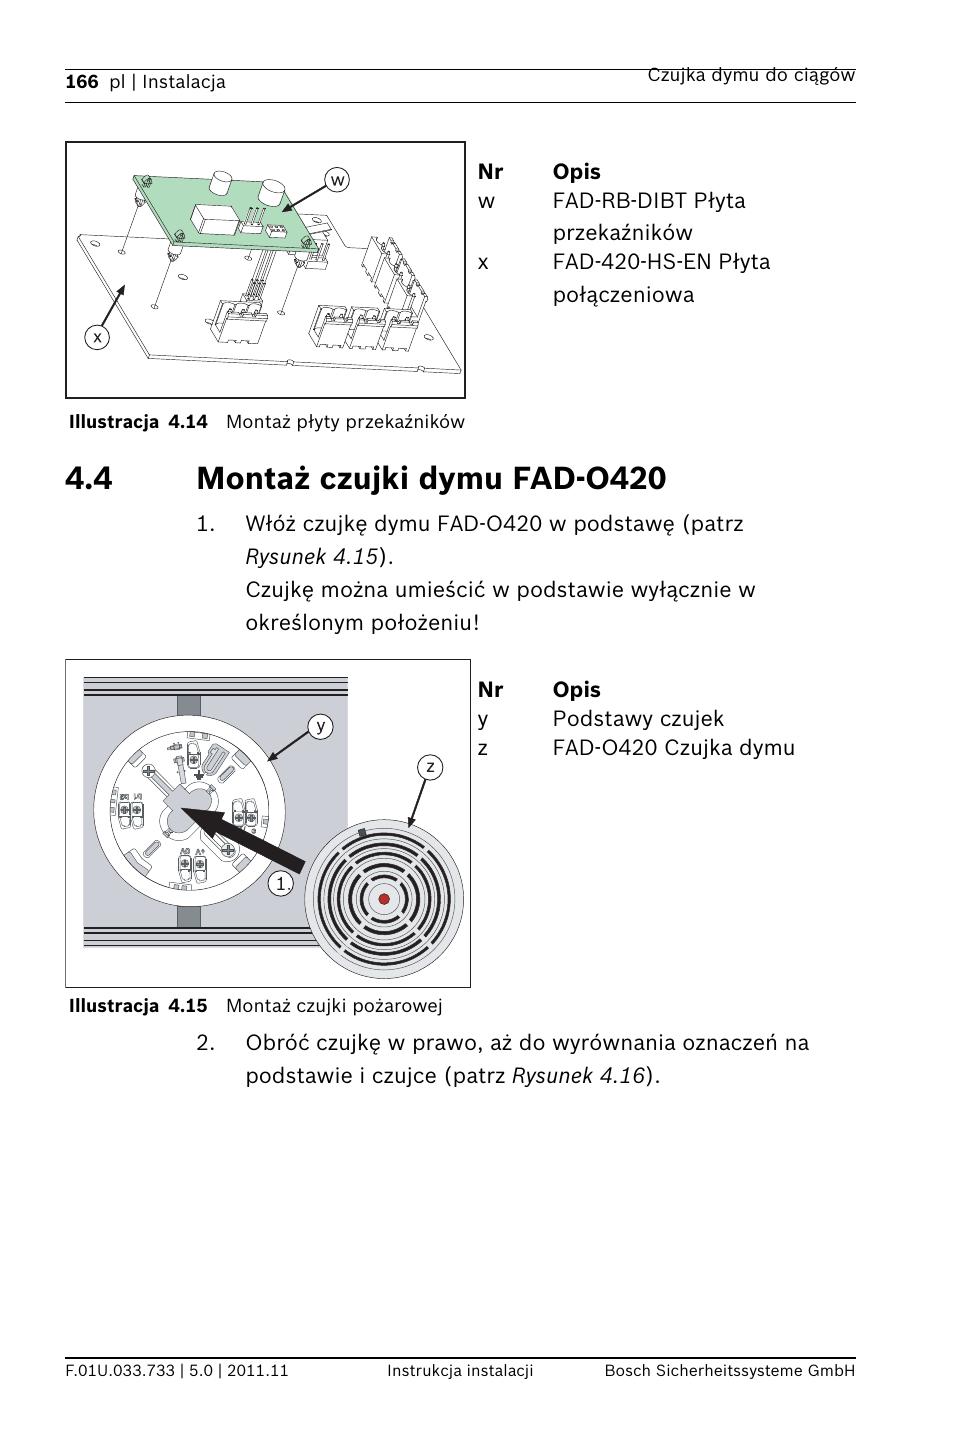 4 Montaz Czujki Dymu Fad O420 Bosch Fad 420 Hs En Duct Smoke